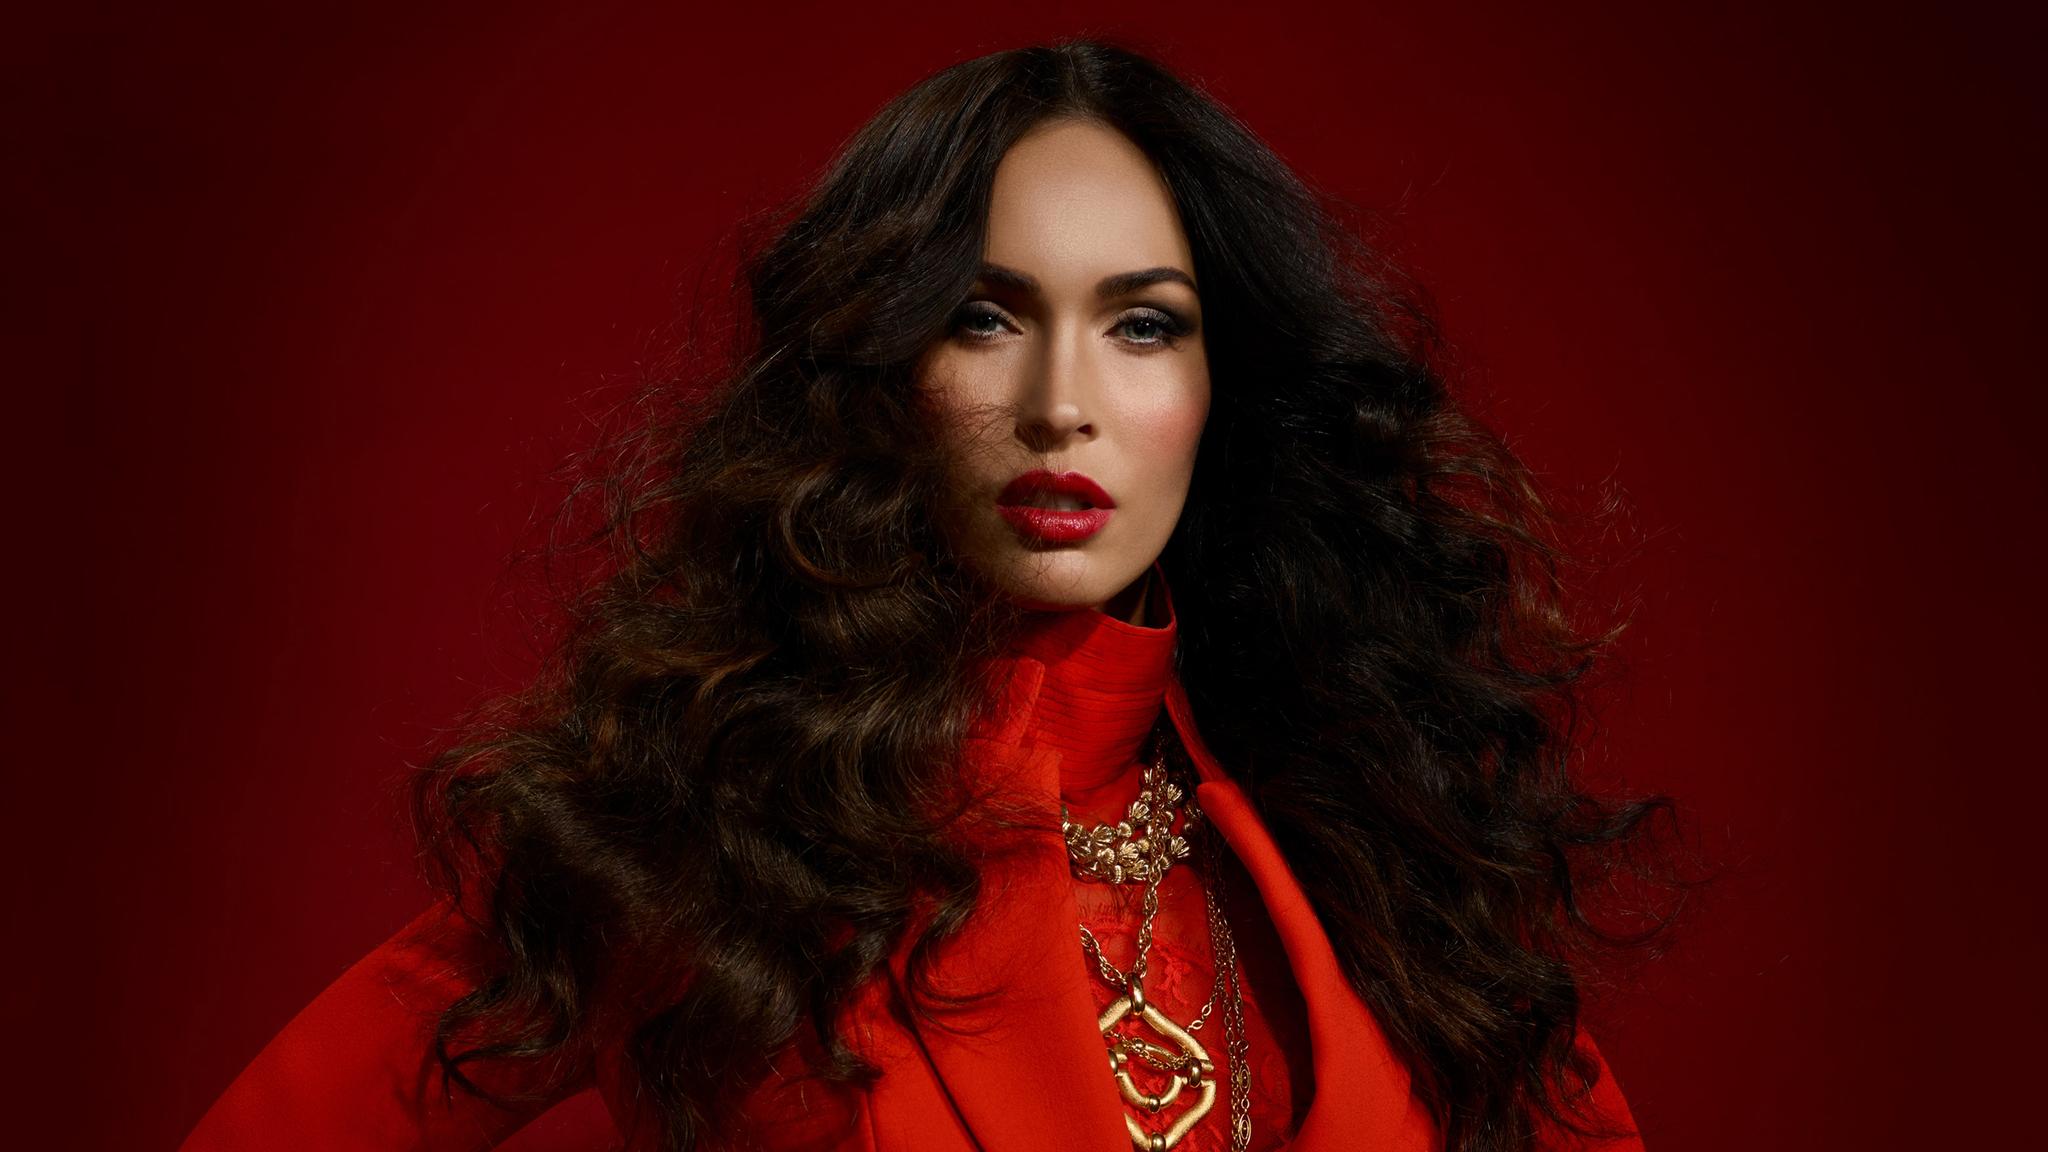 Megan Fox Prestige Magazine 2017 A6